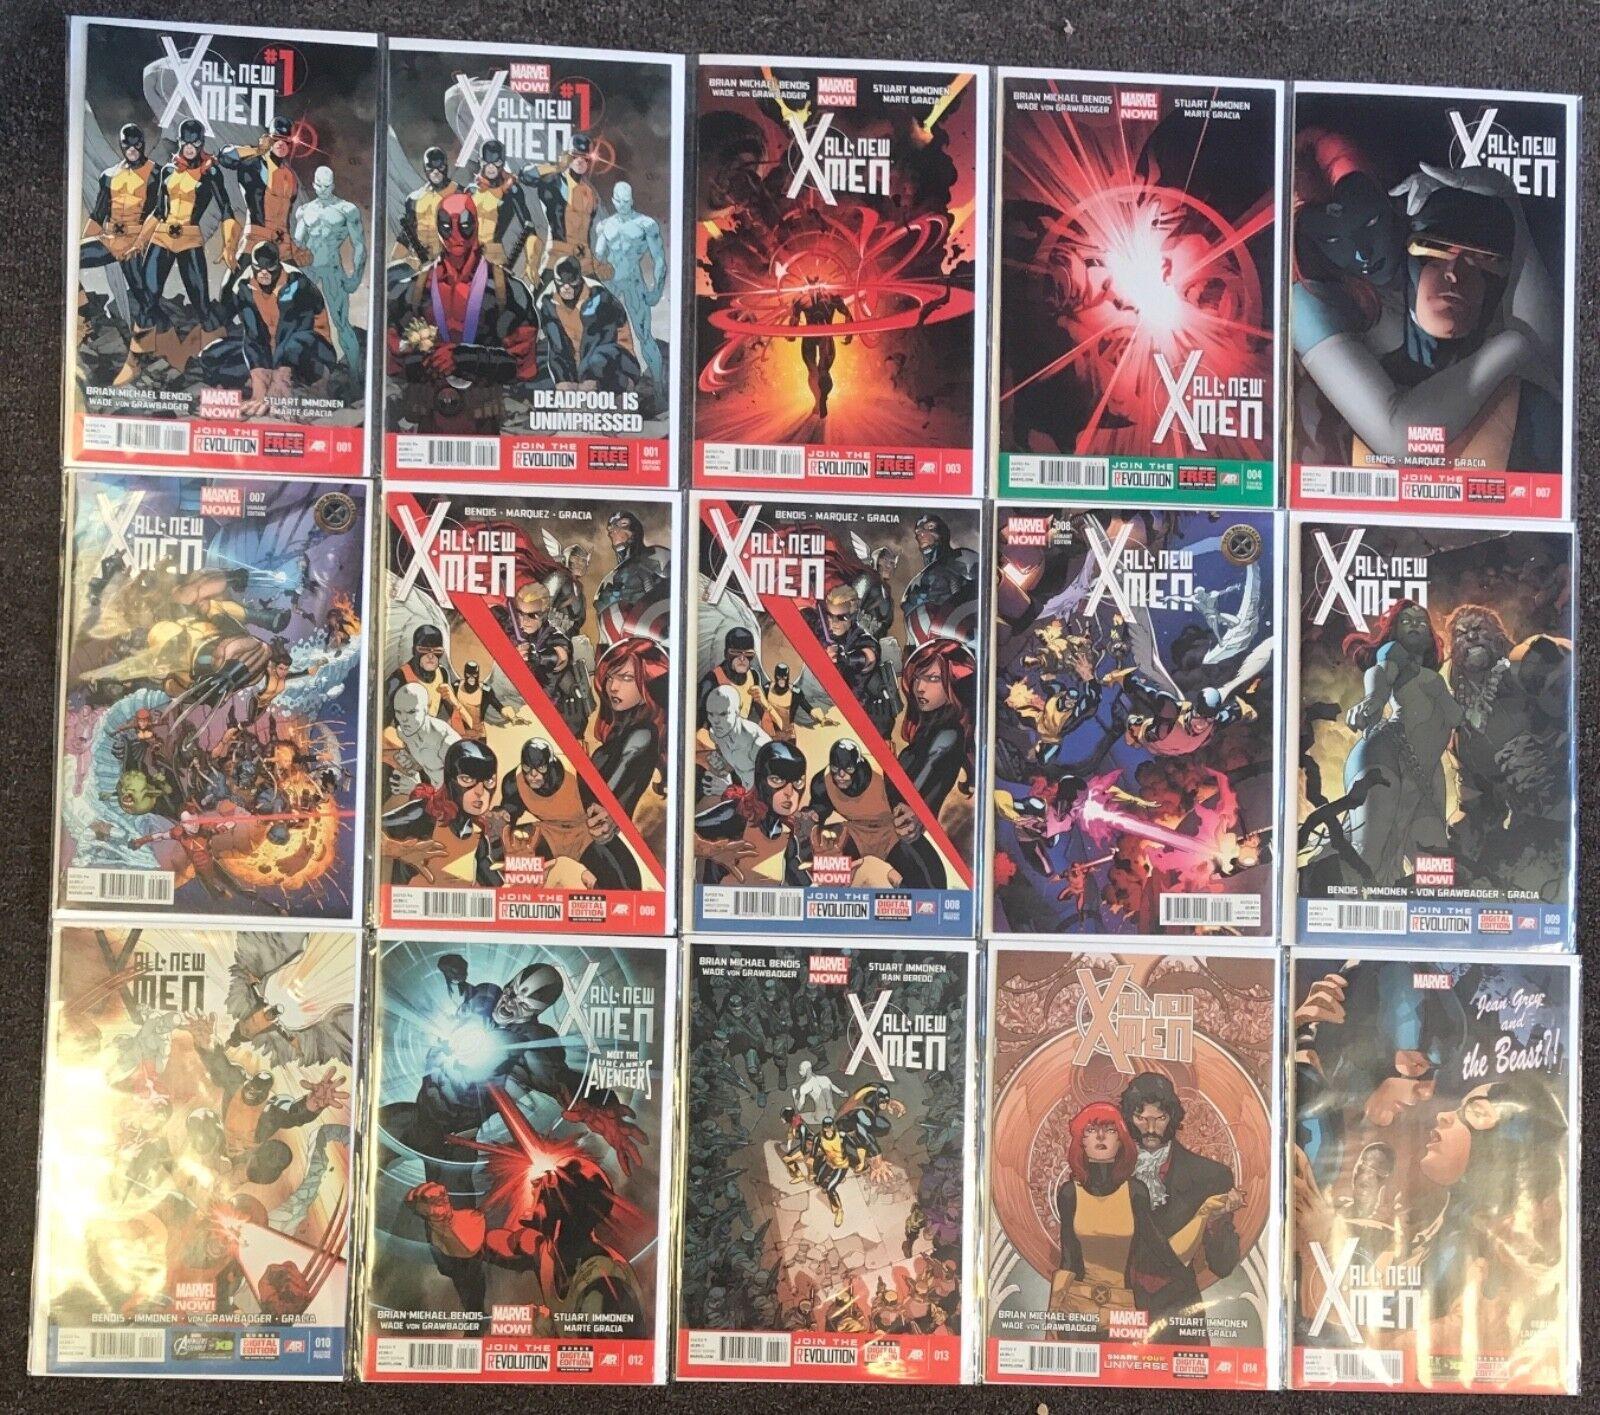 45 All New X-Men annuals Marvel variant lot nm